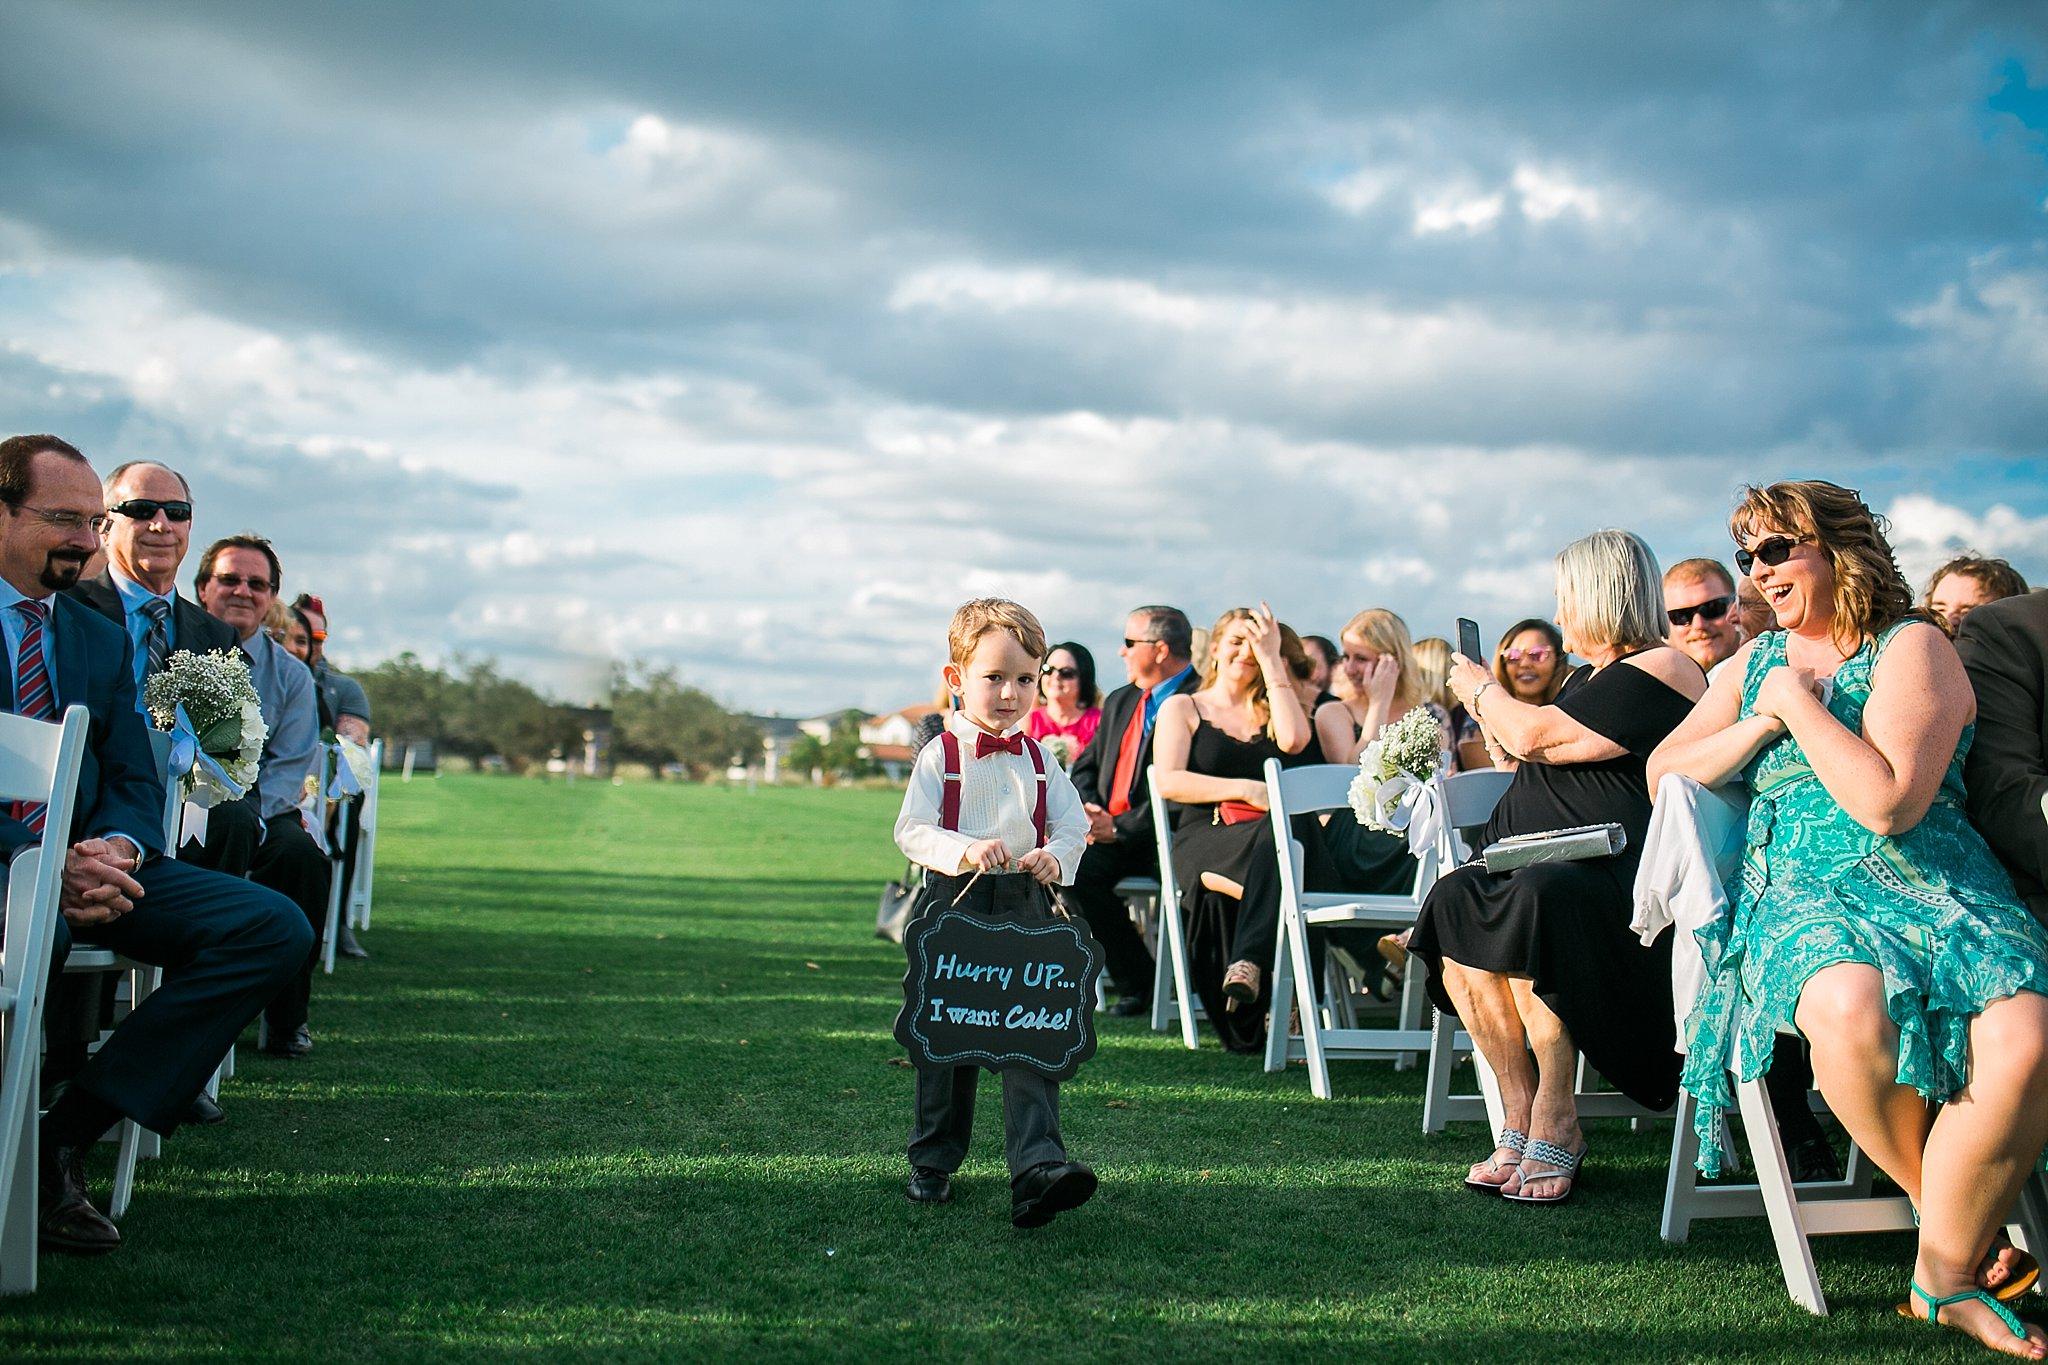 Eagle Creek Golf Club Wedding Orlando Florida Wedding Sweet Alice Photography 28.jpg